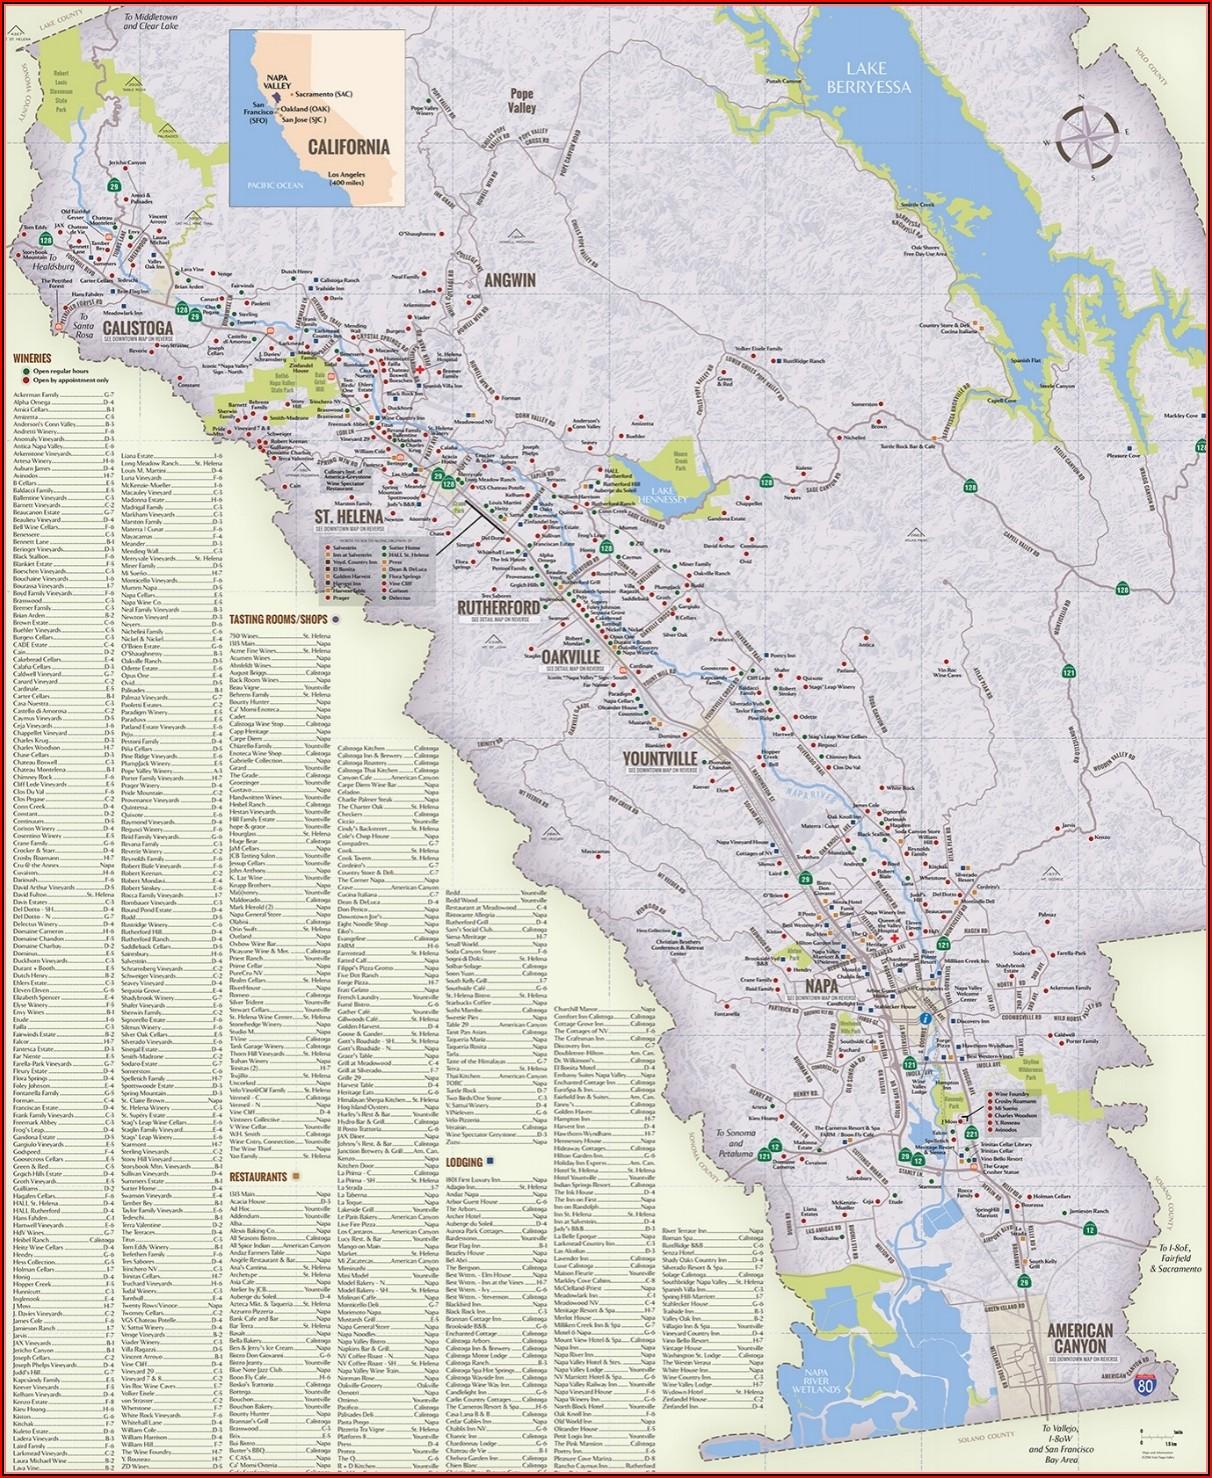 Napa Valley Hotels Map